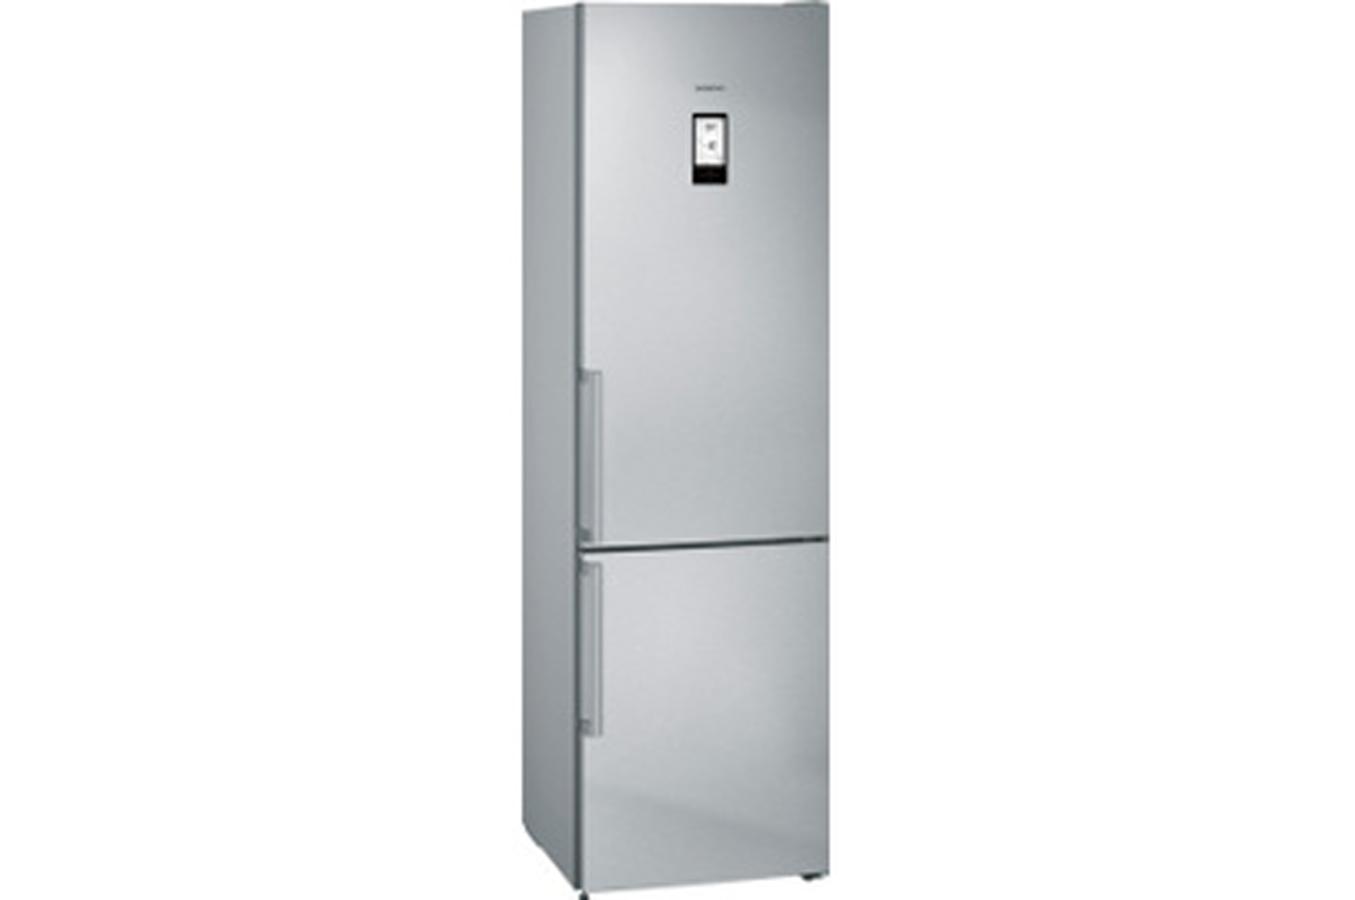 refrigerateur congelateur en bas siemens kg39nai45 4230000 darty. Black Bedroom Furniture Sets. Home Design Ideas